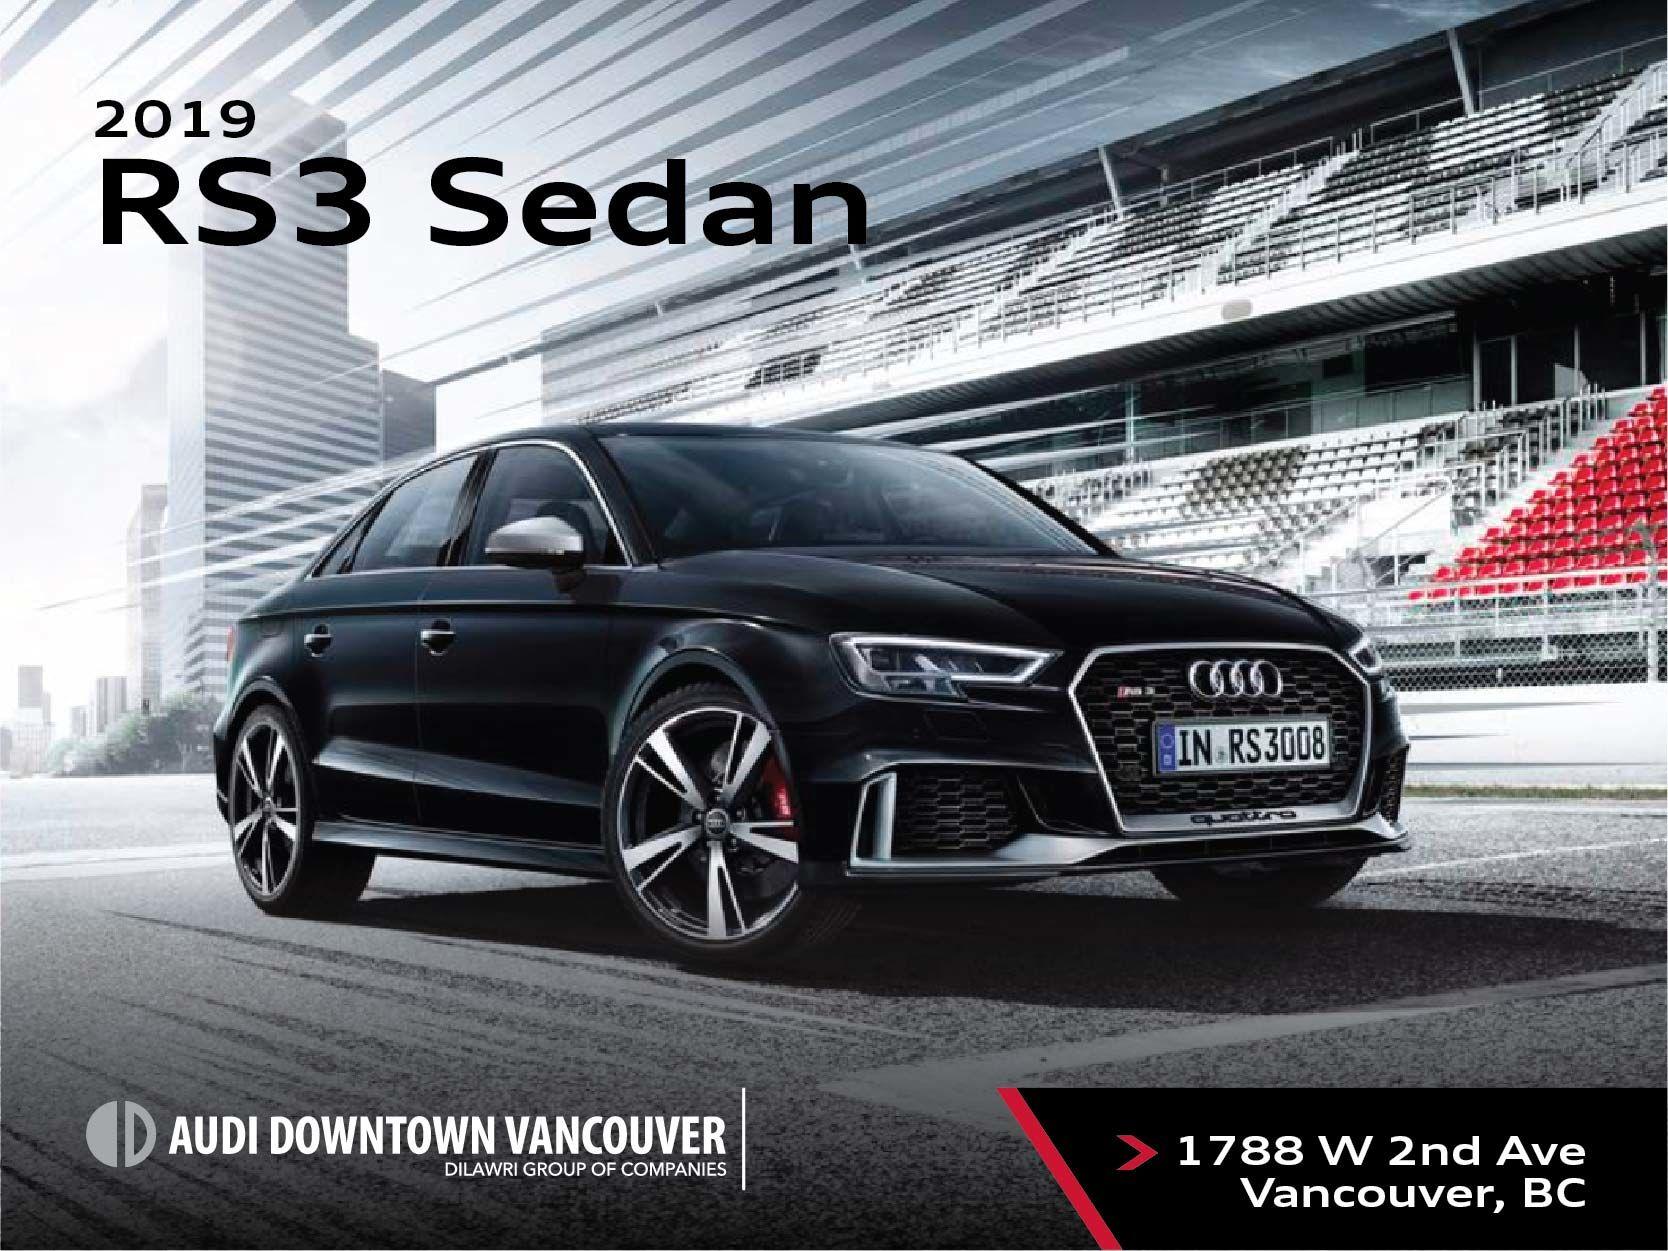 The 2019 Audi RS 3 Sedan